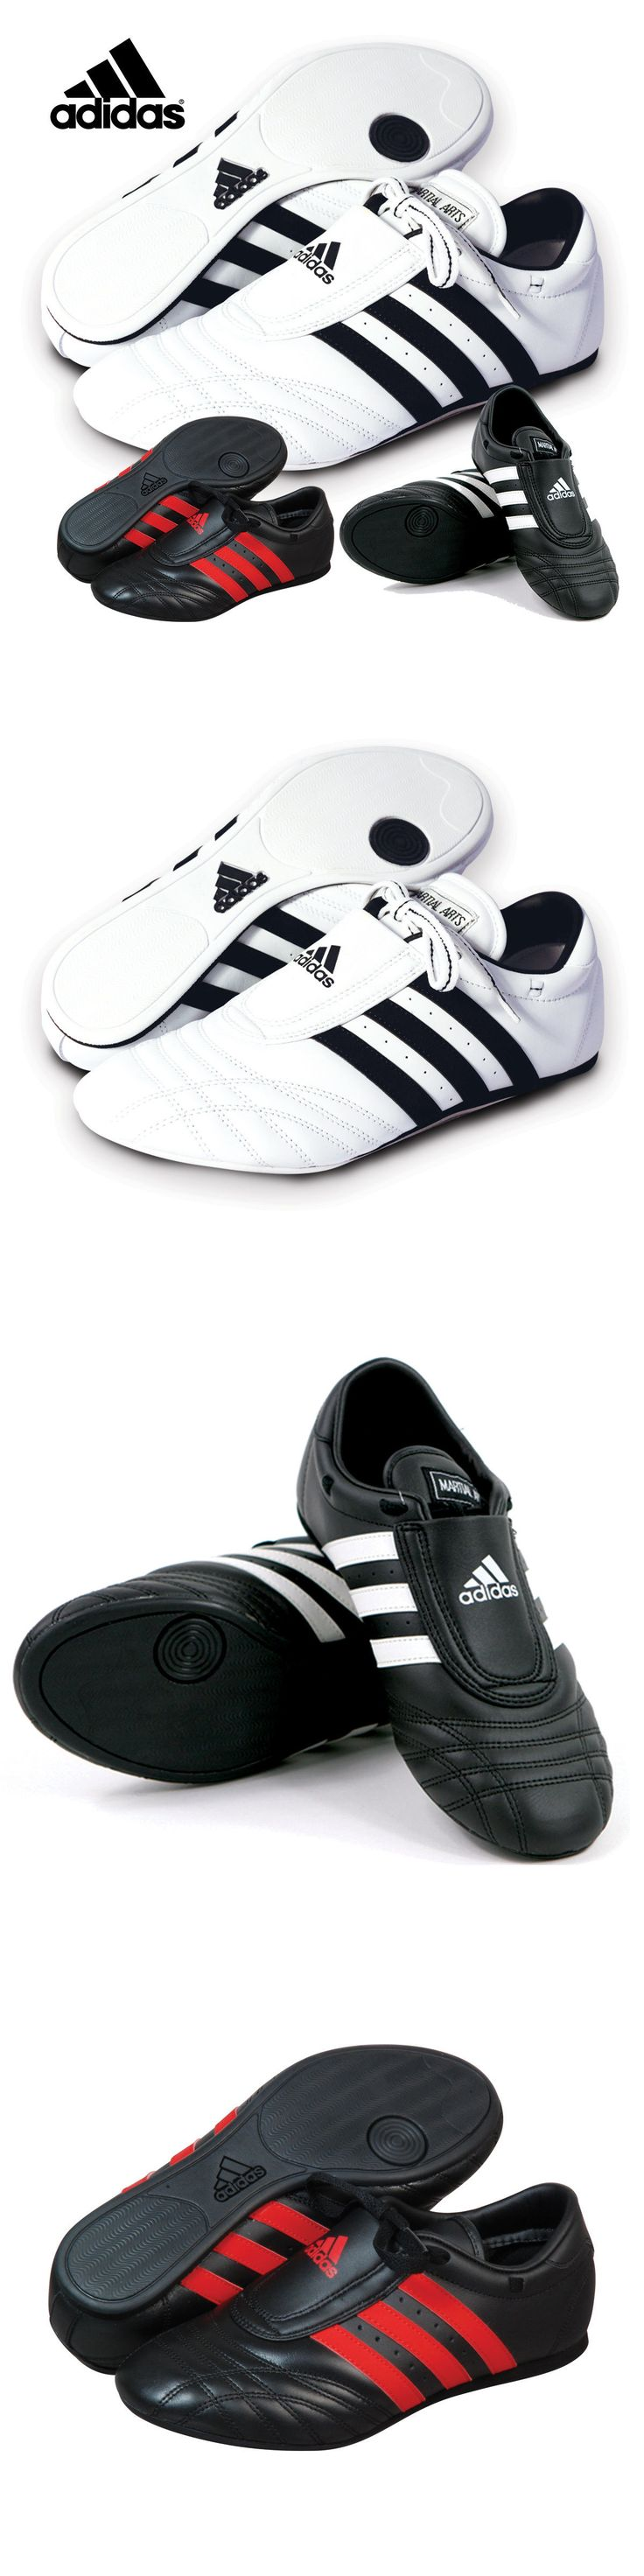 Shoes and Footwear 73989: Adidas Martial Arts Taekwondo Karate Mma Tkd Adi-Sm Ii Shoes -> BUY IT NOW ONLY: $62.45 on eBay!